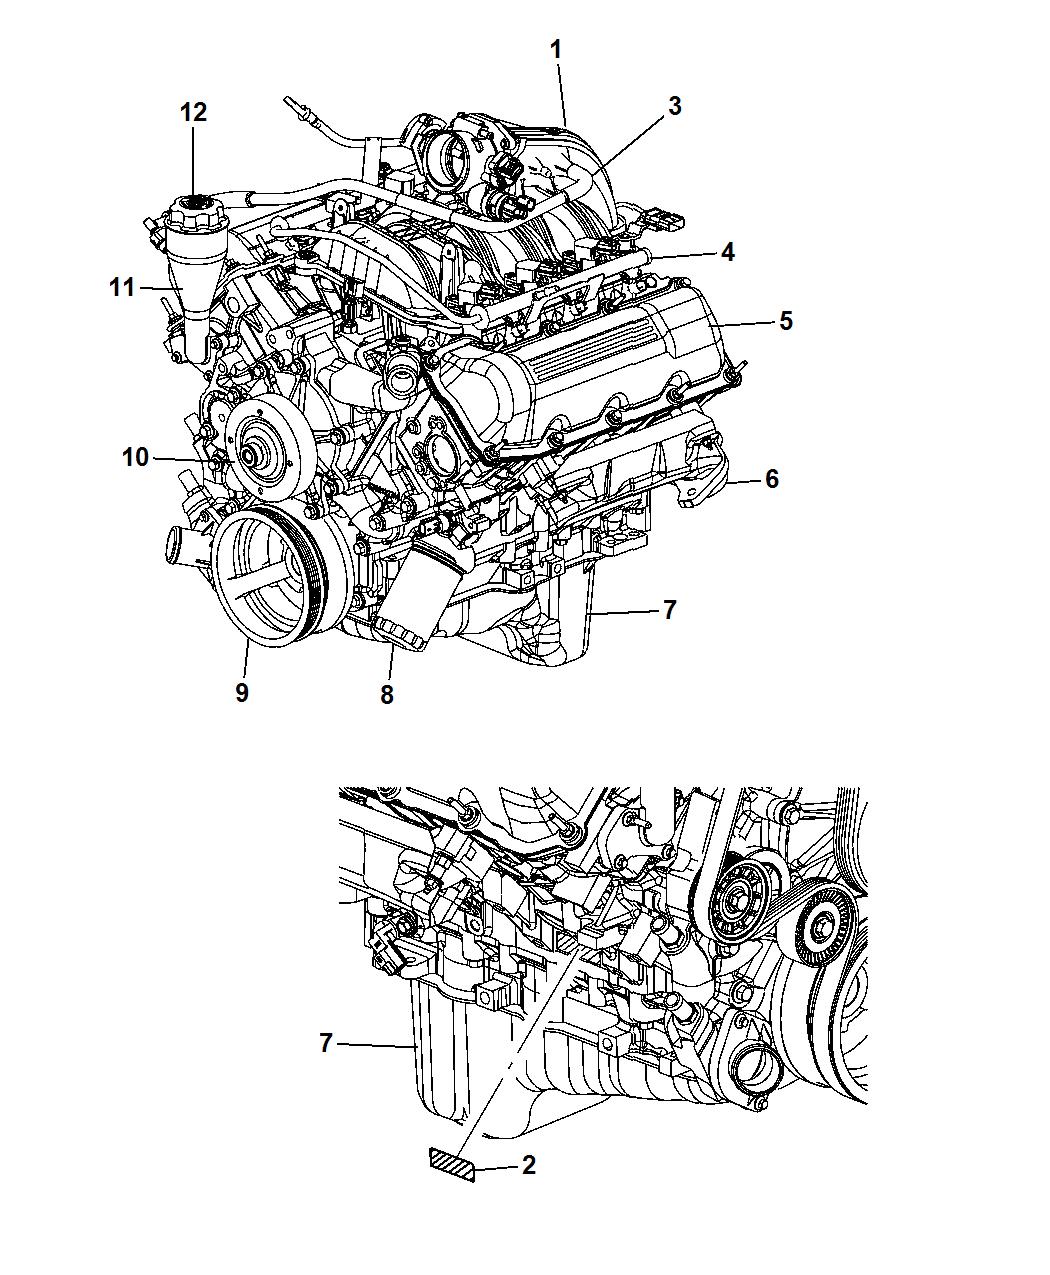 2007 jeep grand cherokee engine diagram - wiring diagrams  leboisenchante.fr